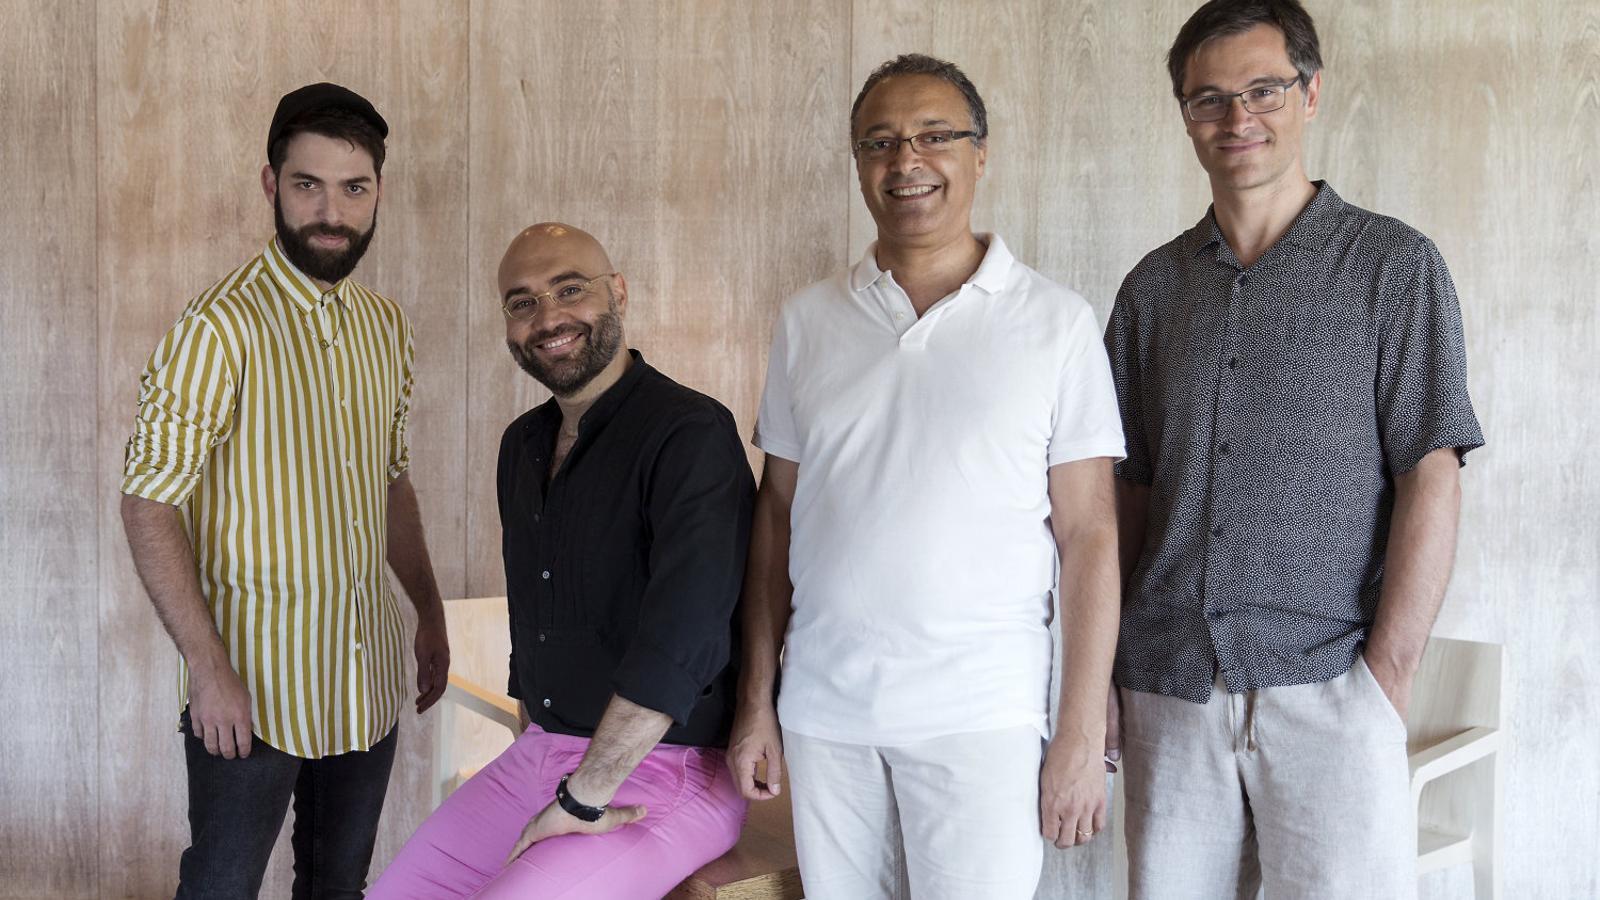 Rafael R. Villalobos, Xavier Sabata, Fausto Nardi i Dani Espasa. / DANI RÍOS